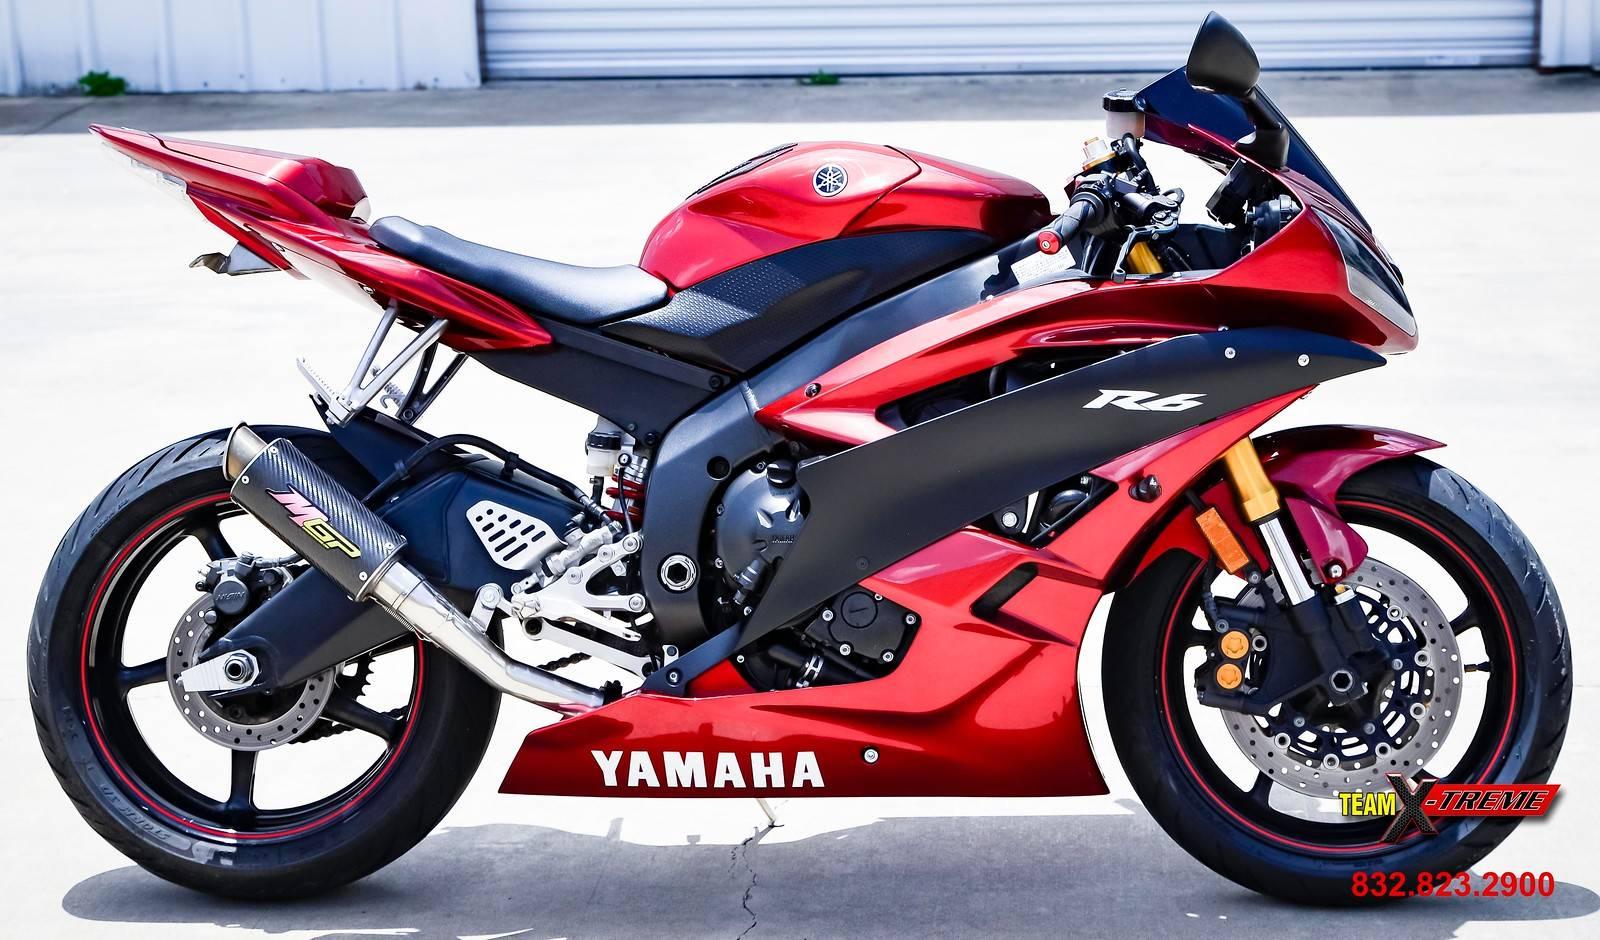 2007 Yamaha YZF-R6 3